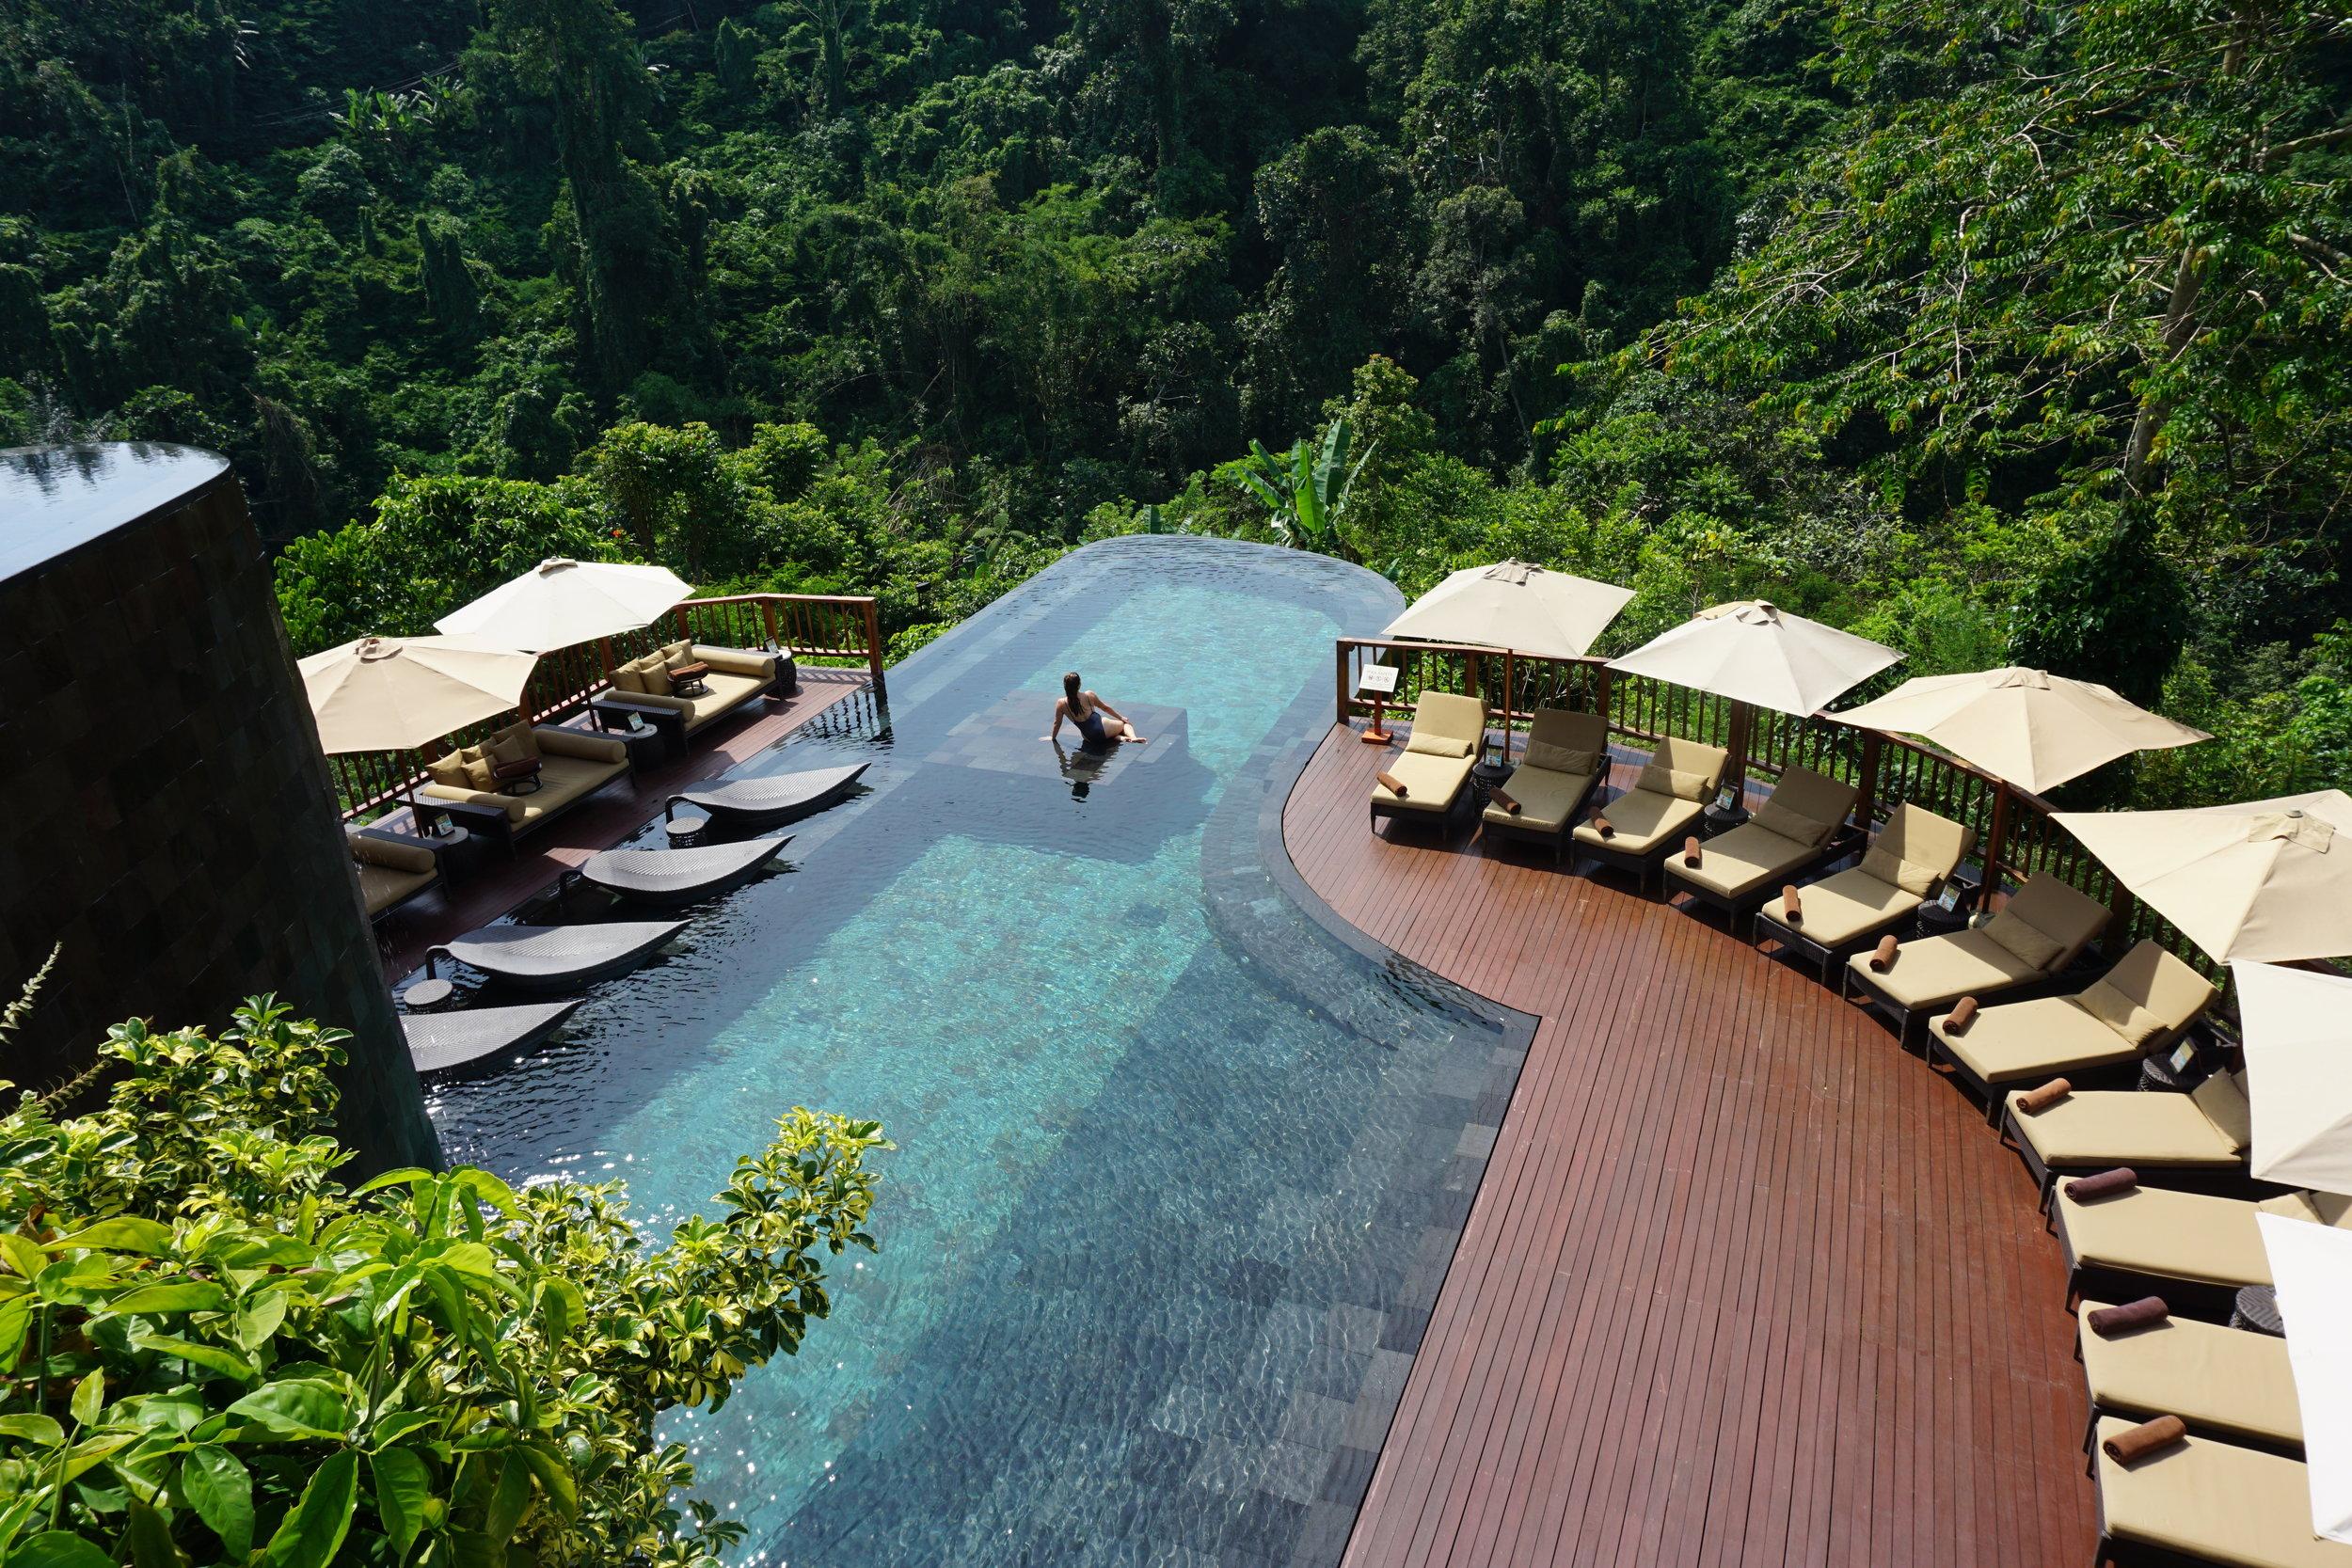 The Hanging Gardens of Bali